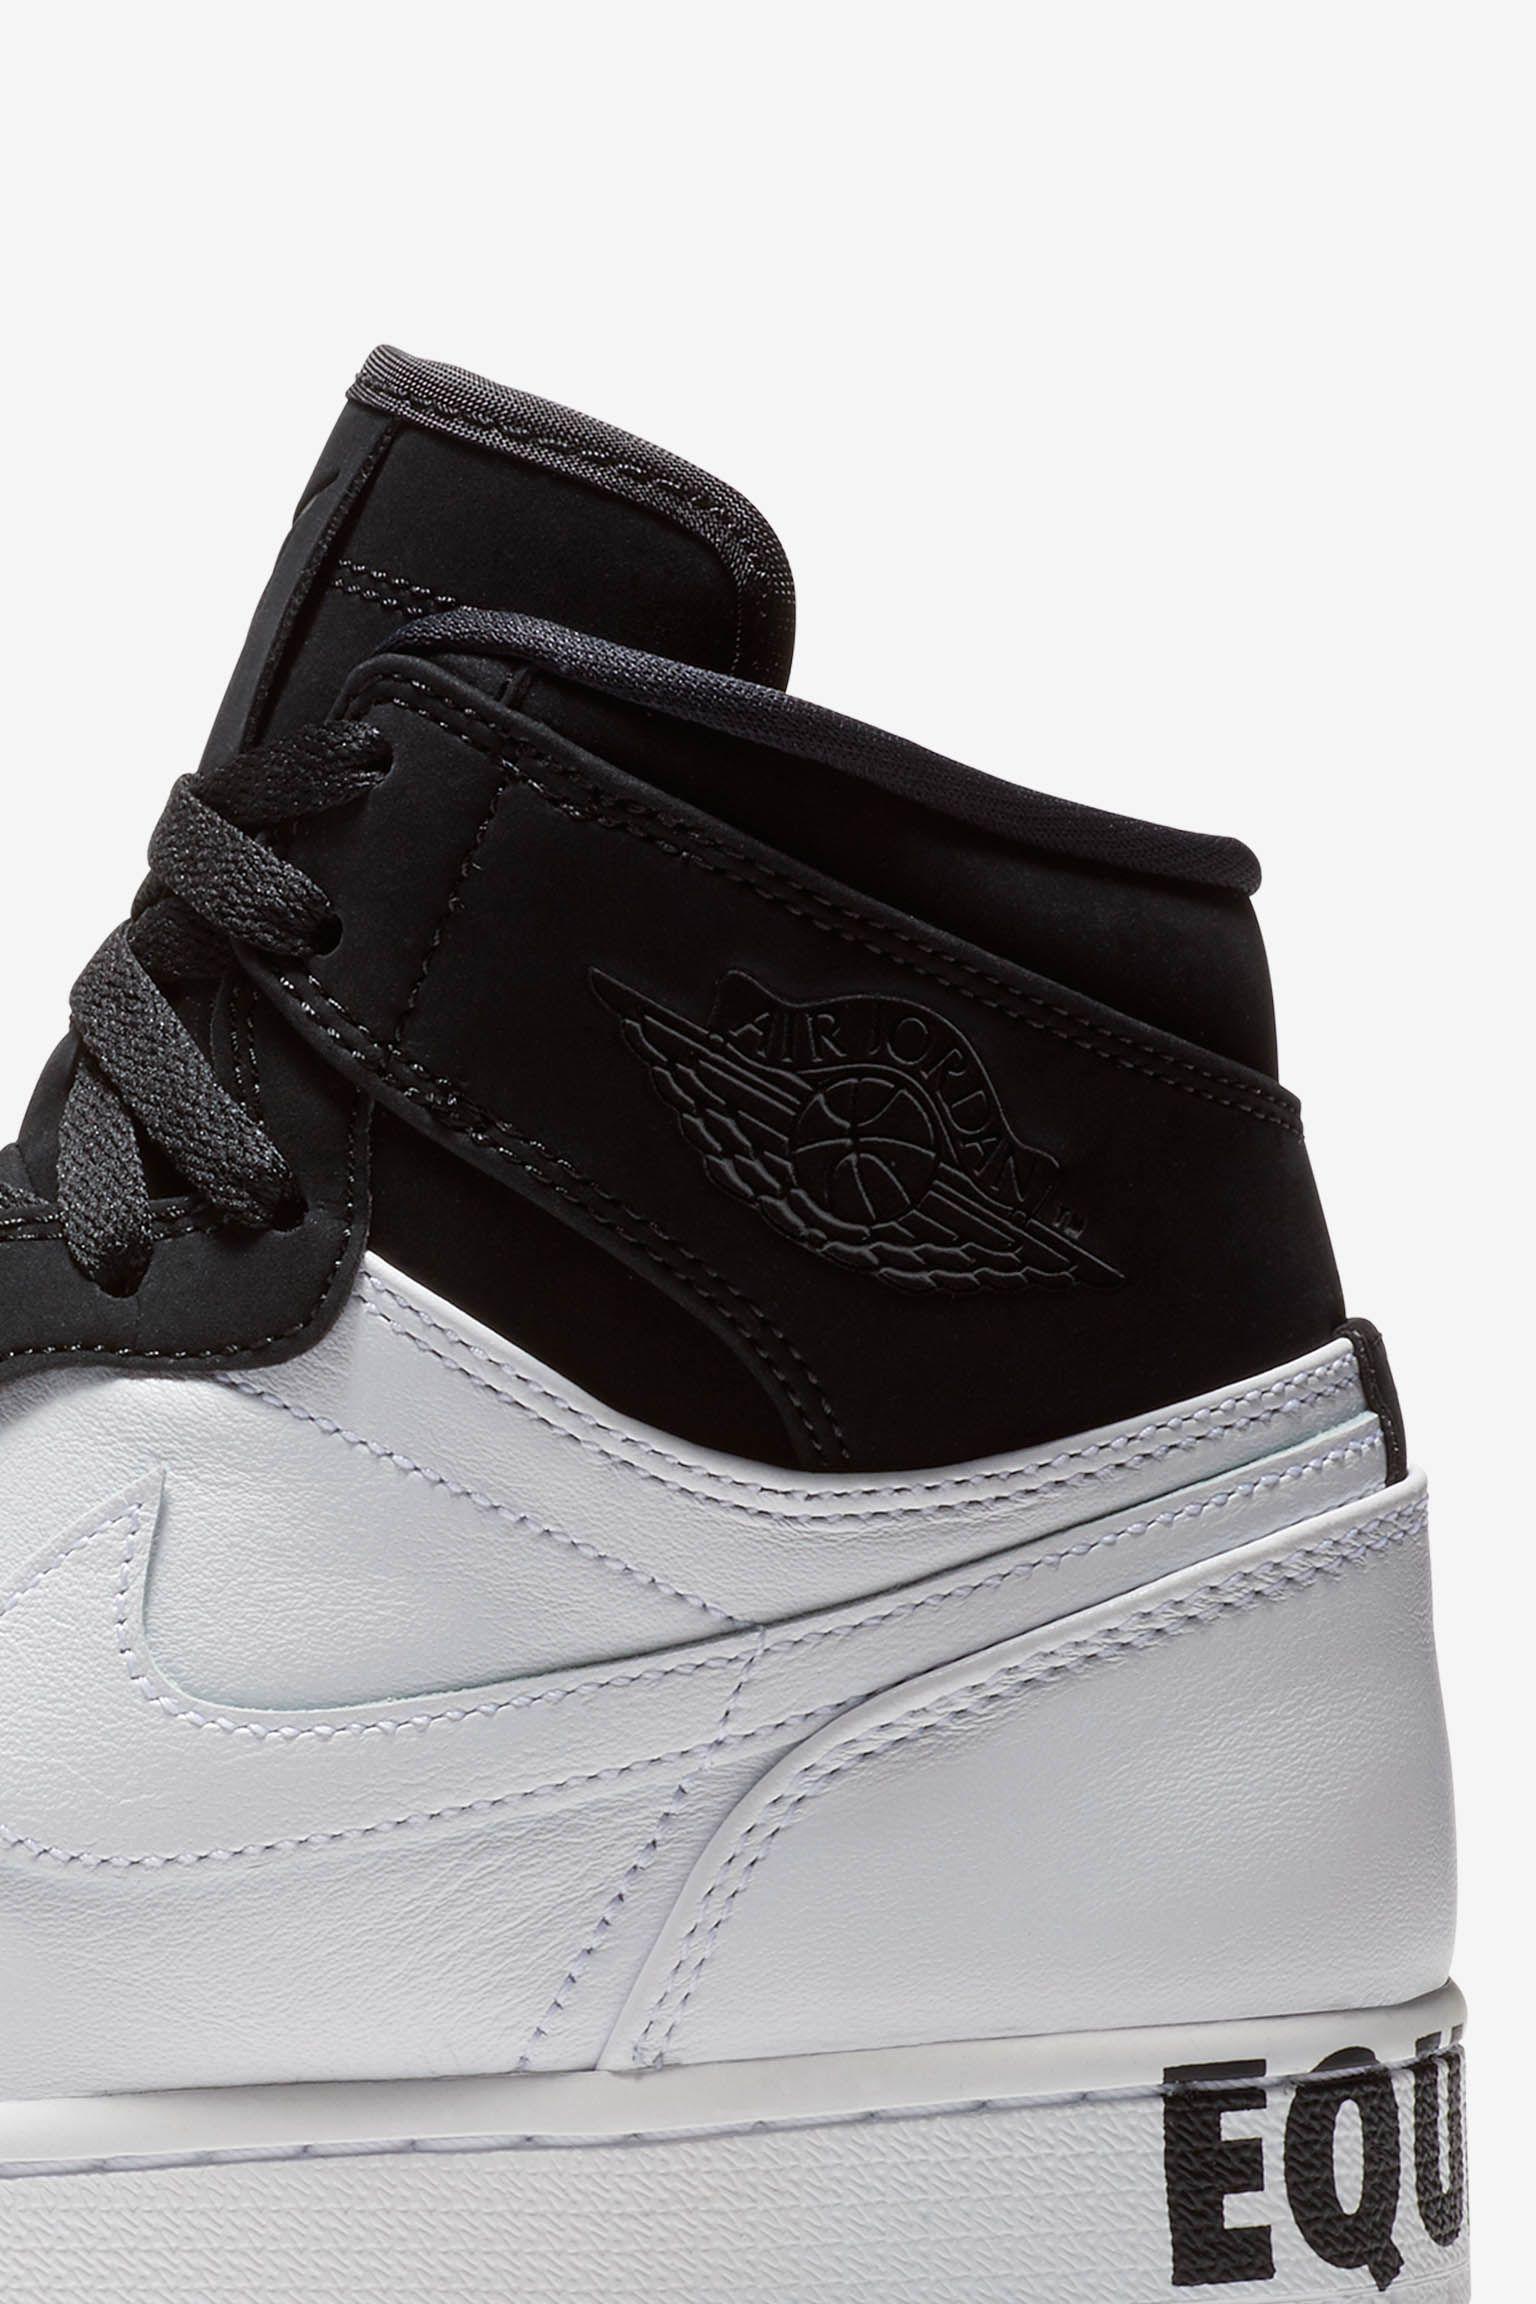 Air Jordan 1 'Equality' 2018 Release Date